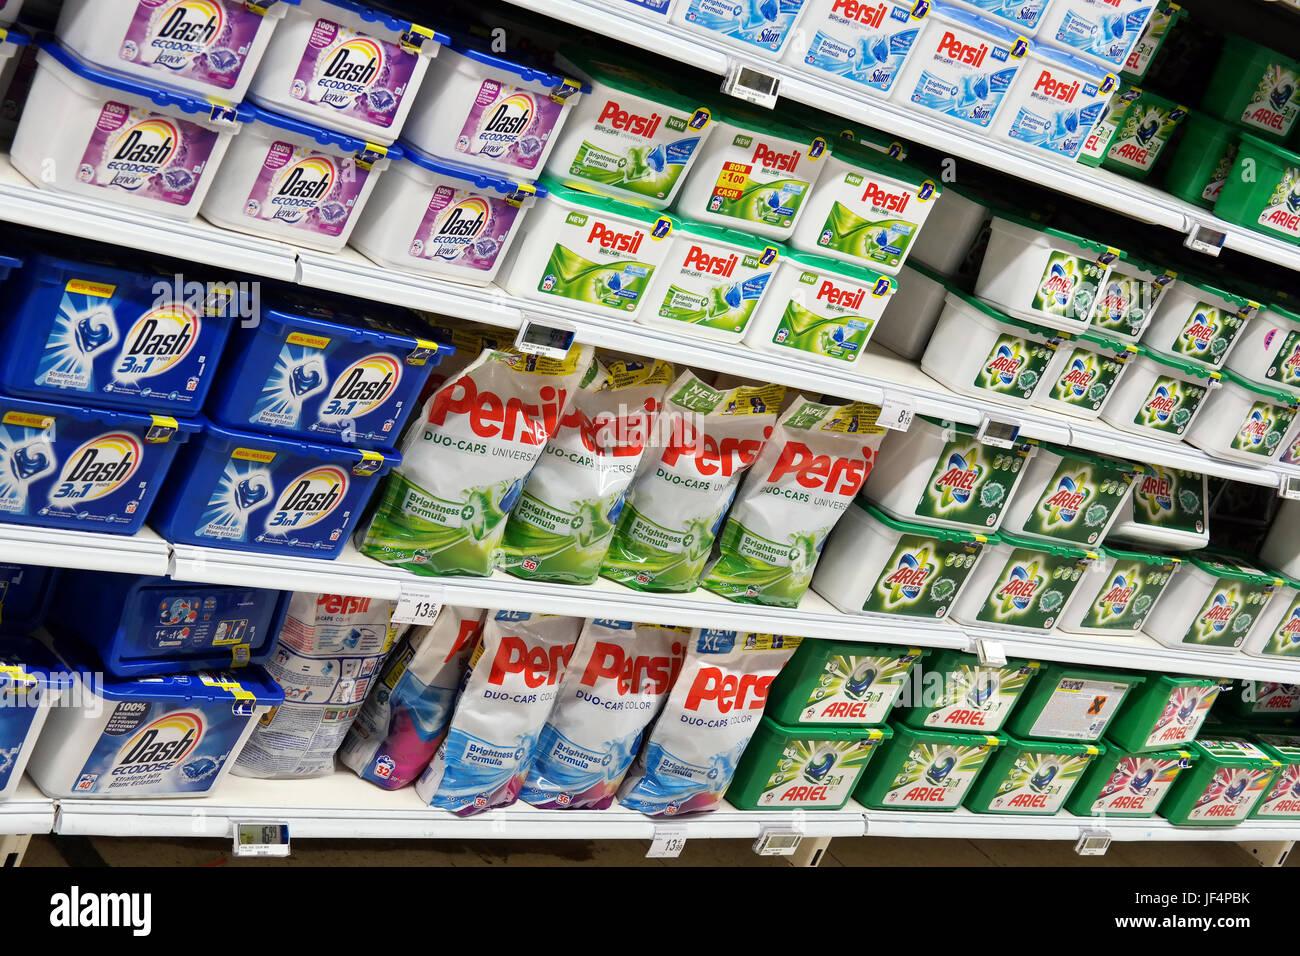 Dash, Persil and Ariel washing powder on a supermarket shelf - Stock Image